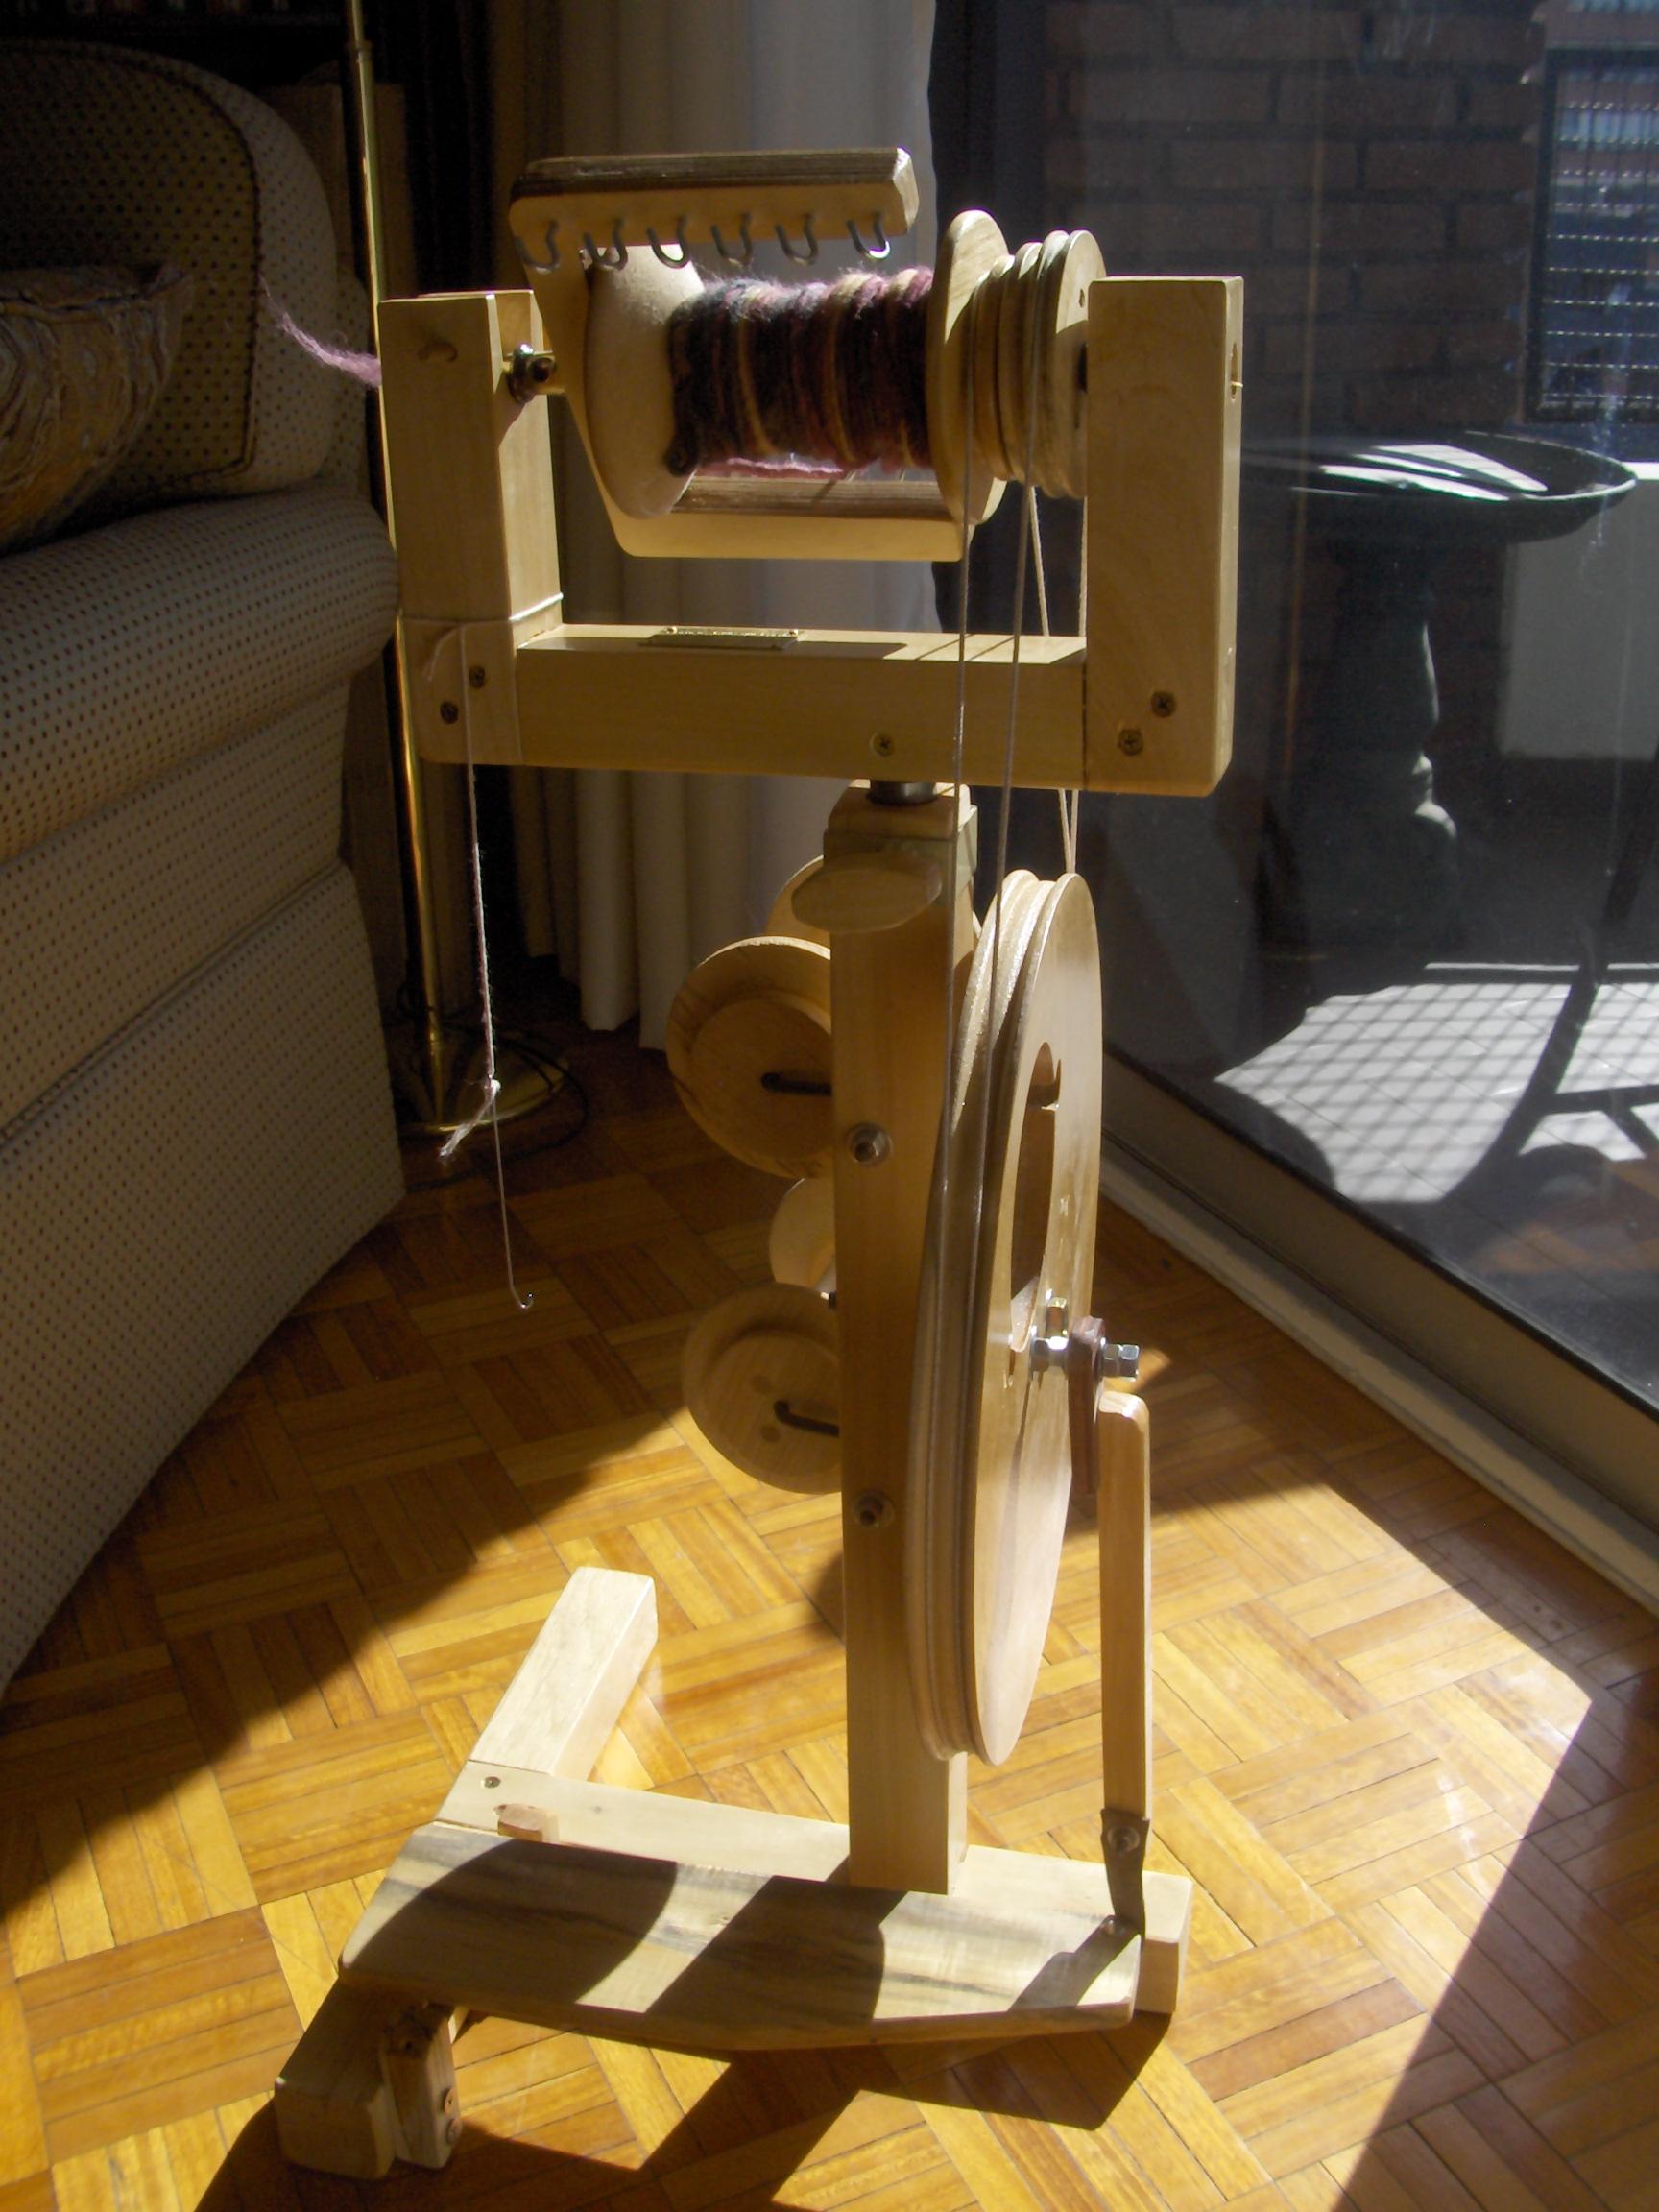 Second photo of my wheel